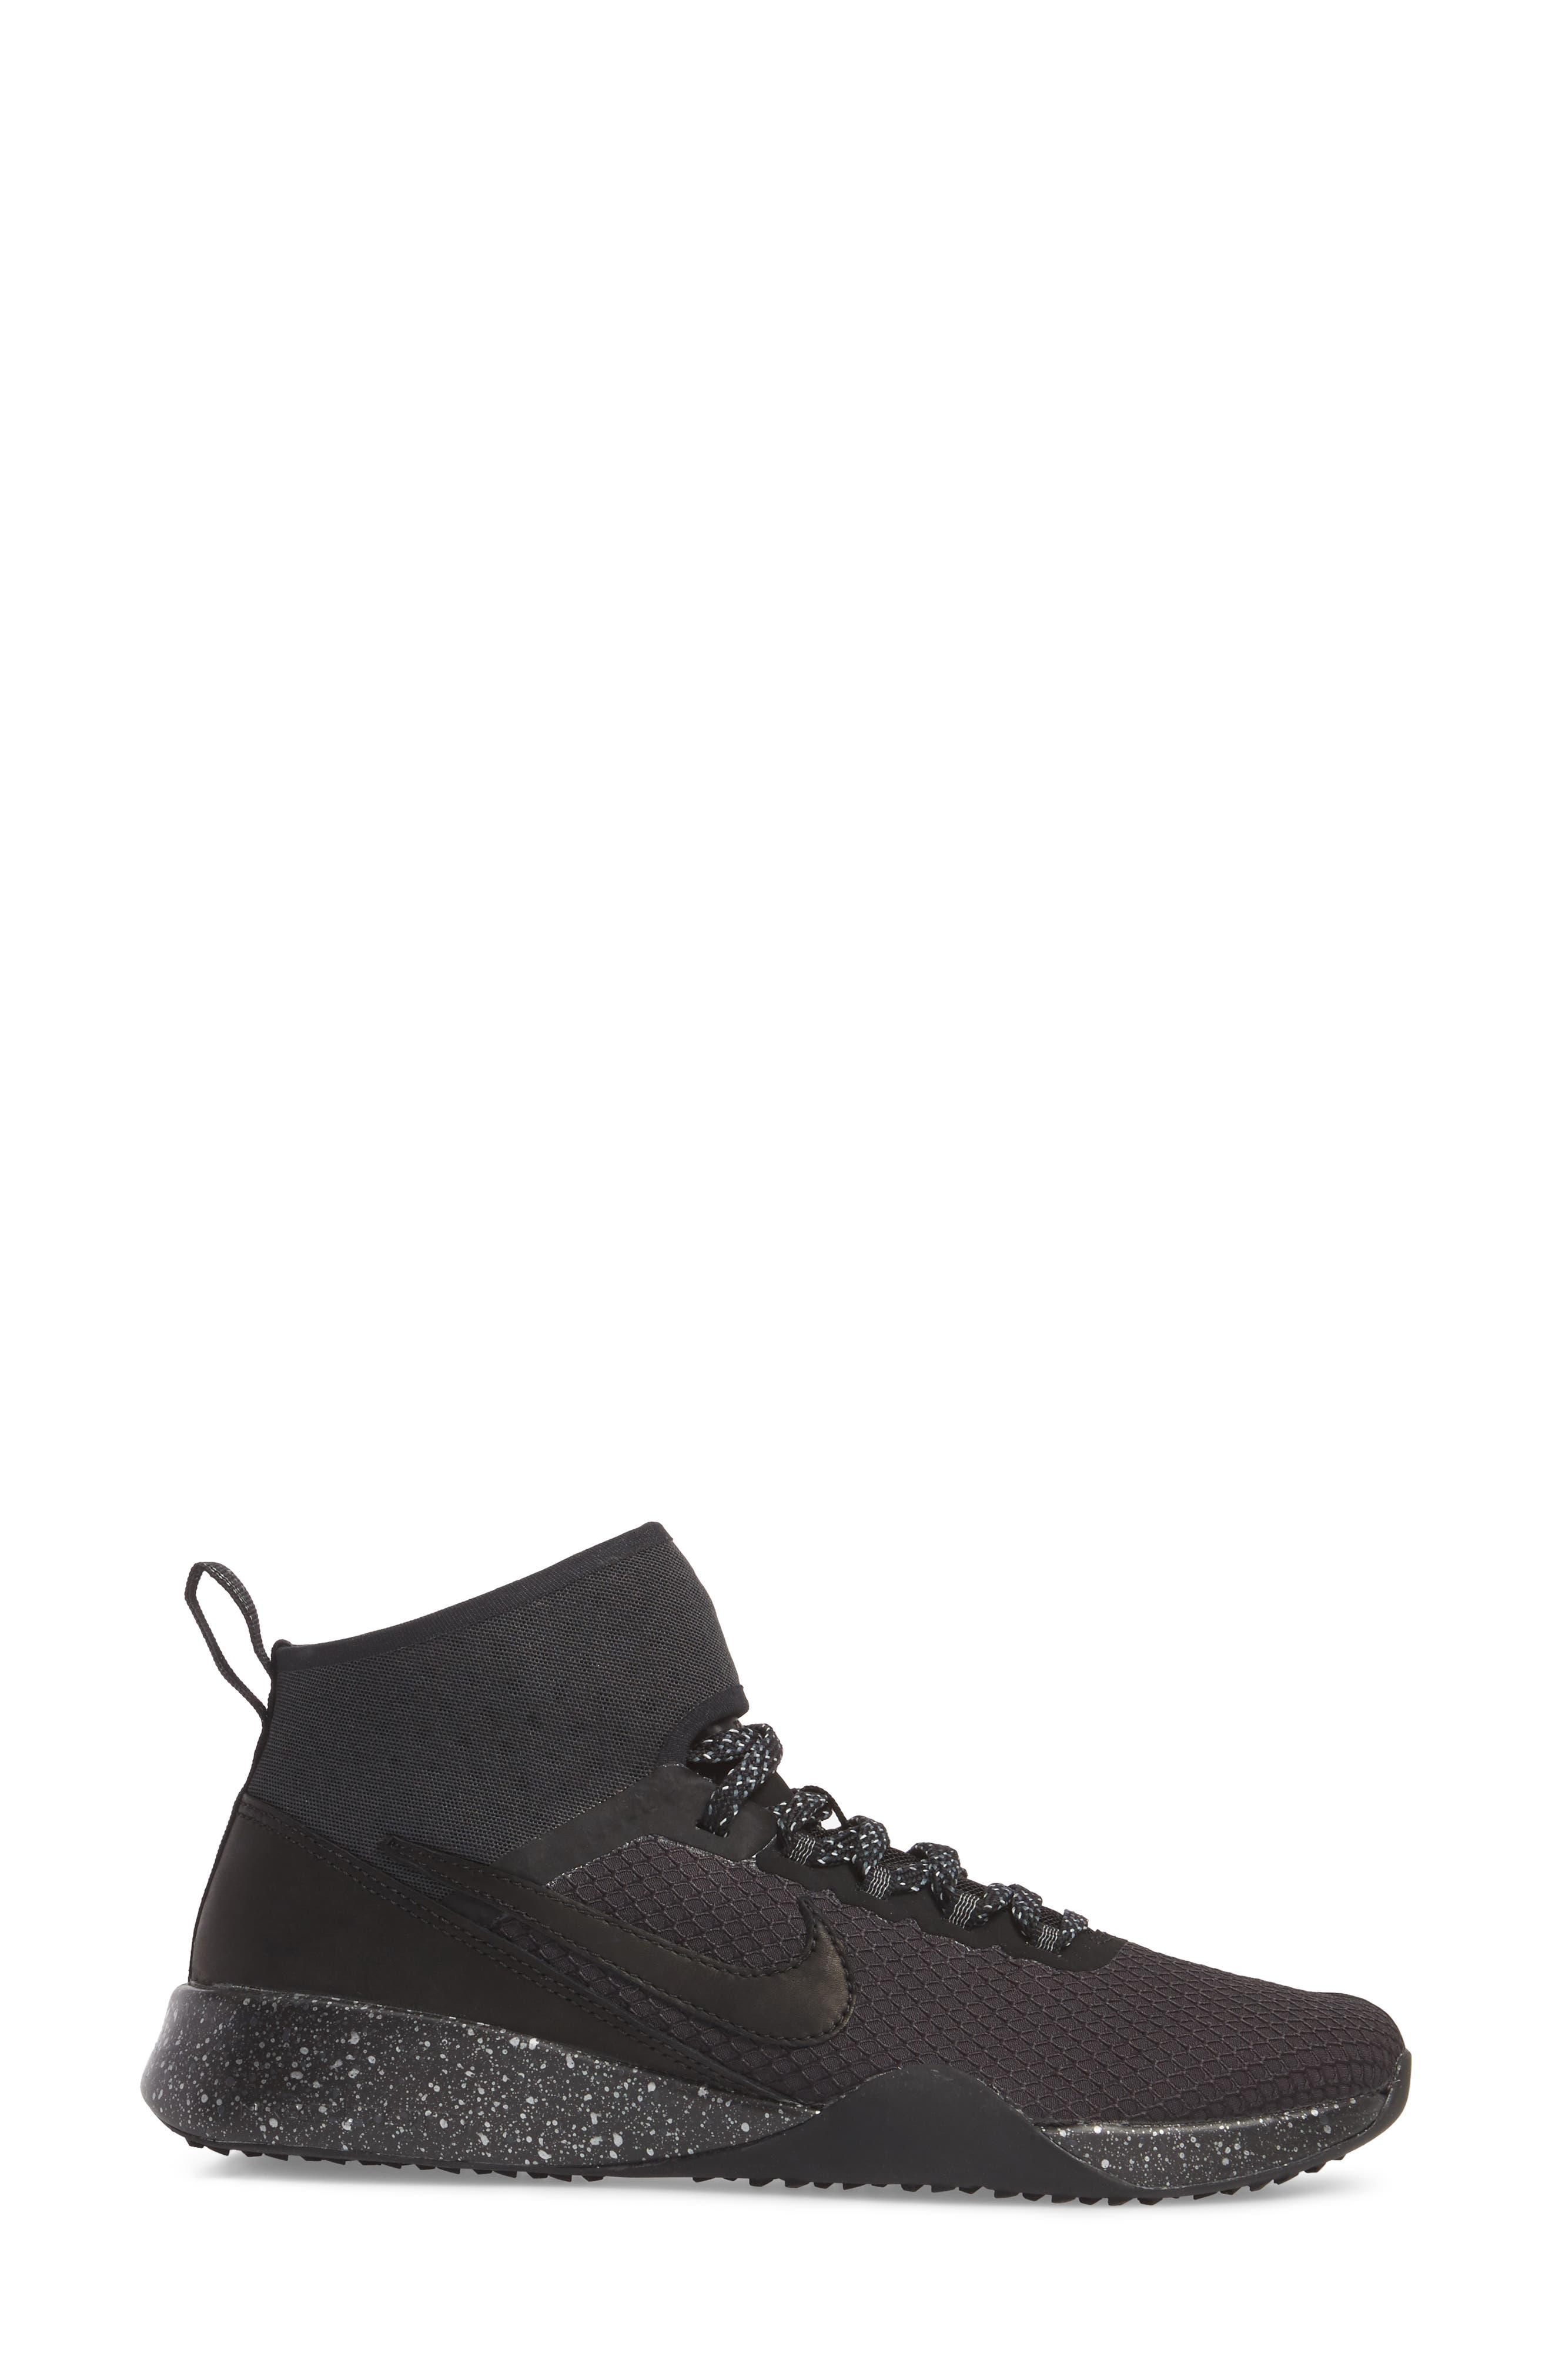 NikeLab Air Zoom Strong 2 Training Shoe,                             Alternate thumbnail 3, color,                             001